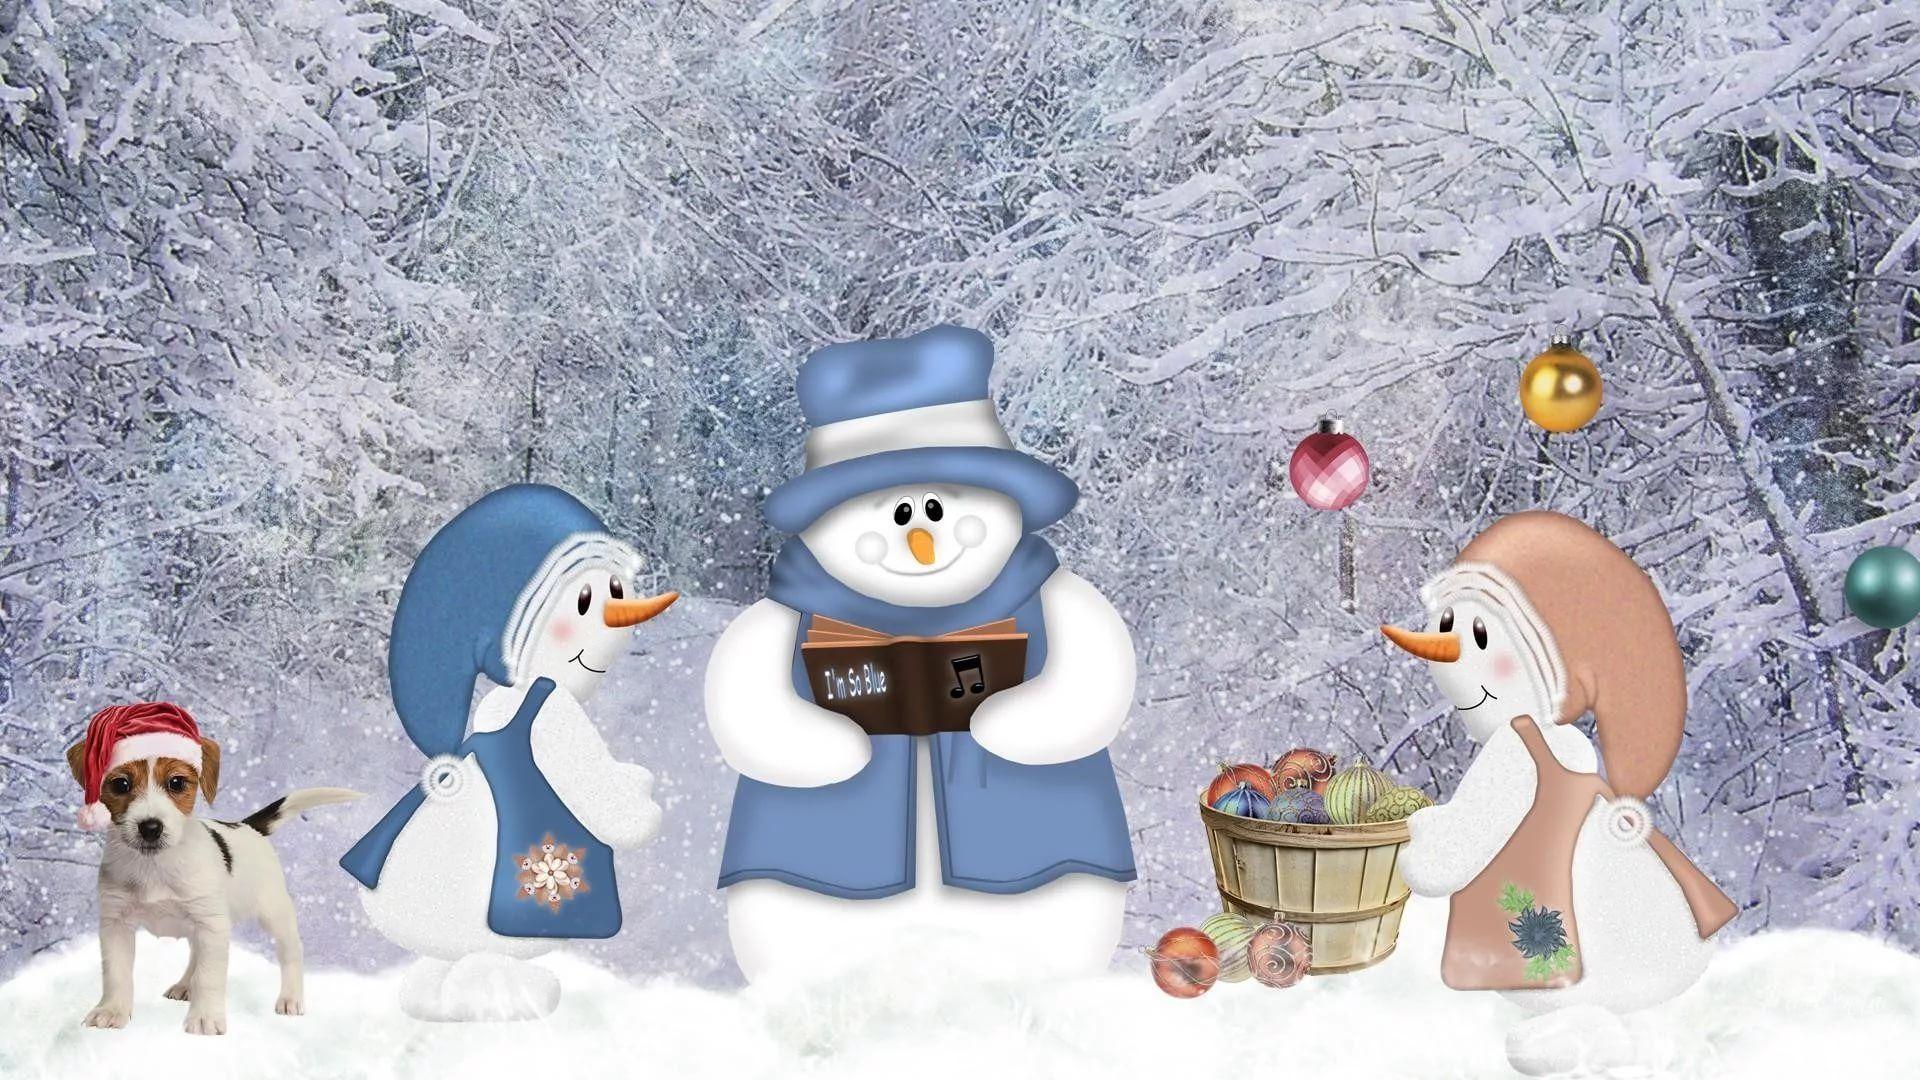 Cute Winter desktop wallpaper download